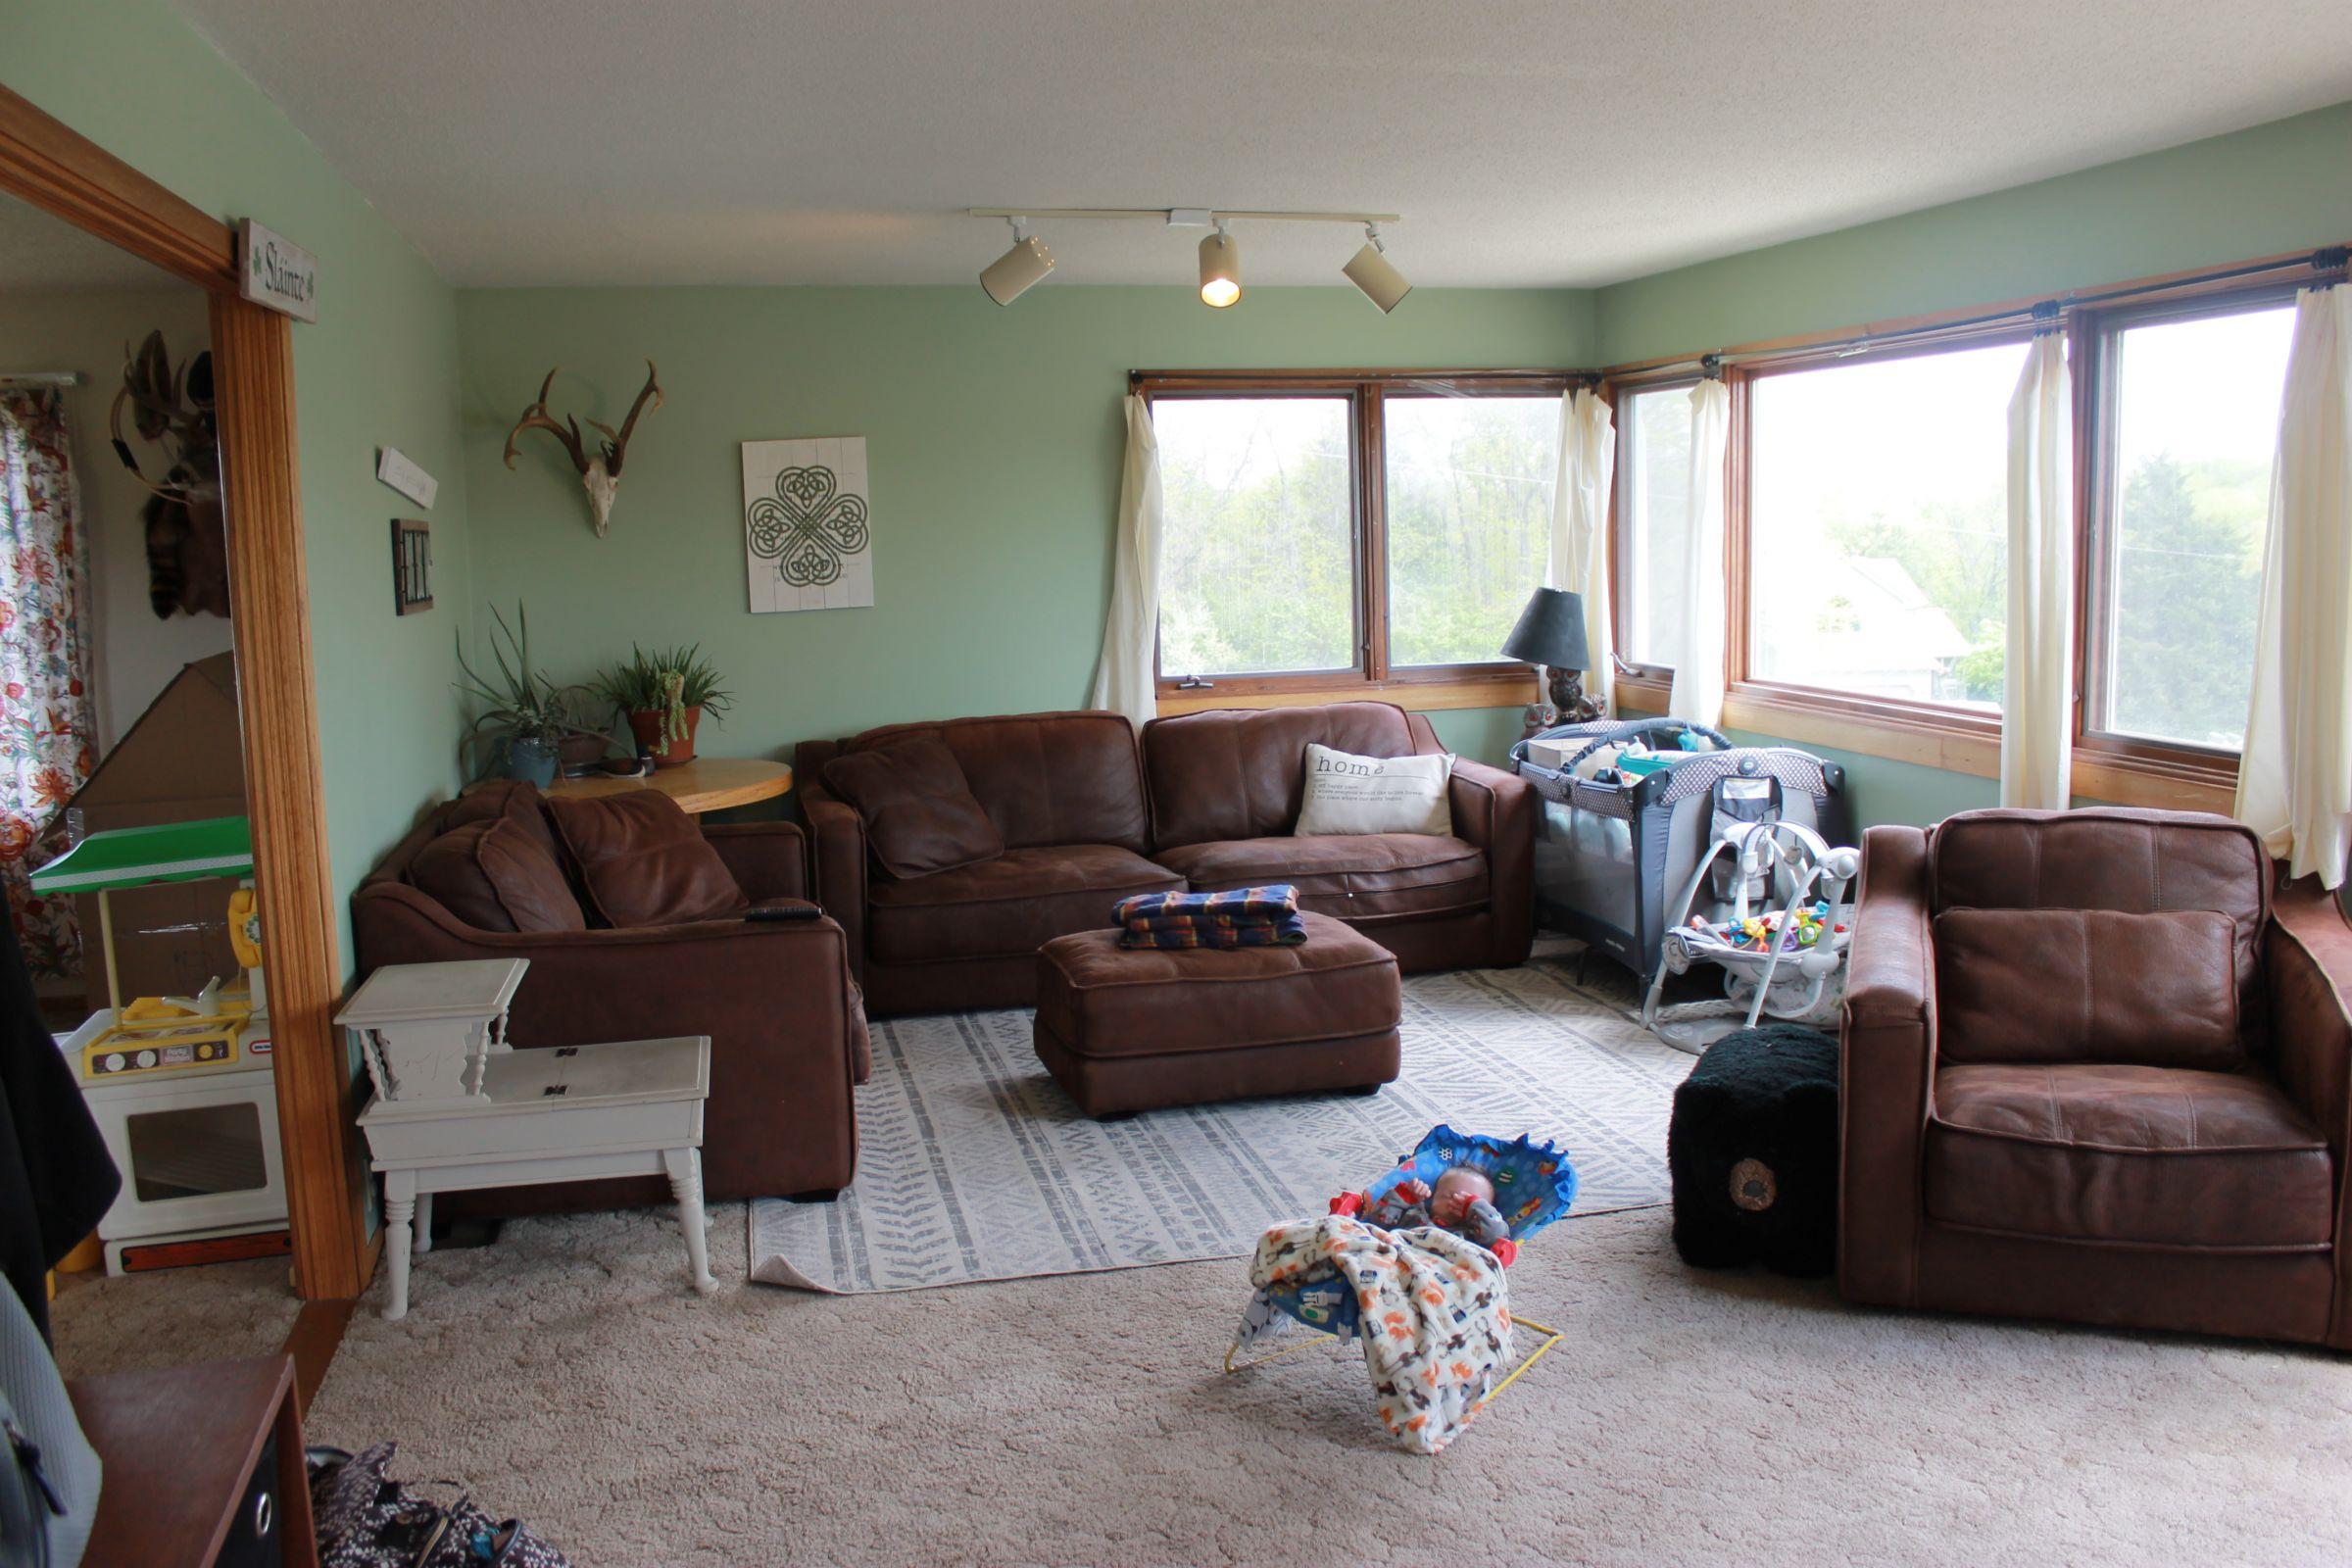 residential-development-land-warren-county-iowa-38-acres-listing-number-15513-0-2021-05-06-210429.JPG